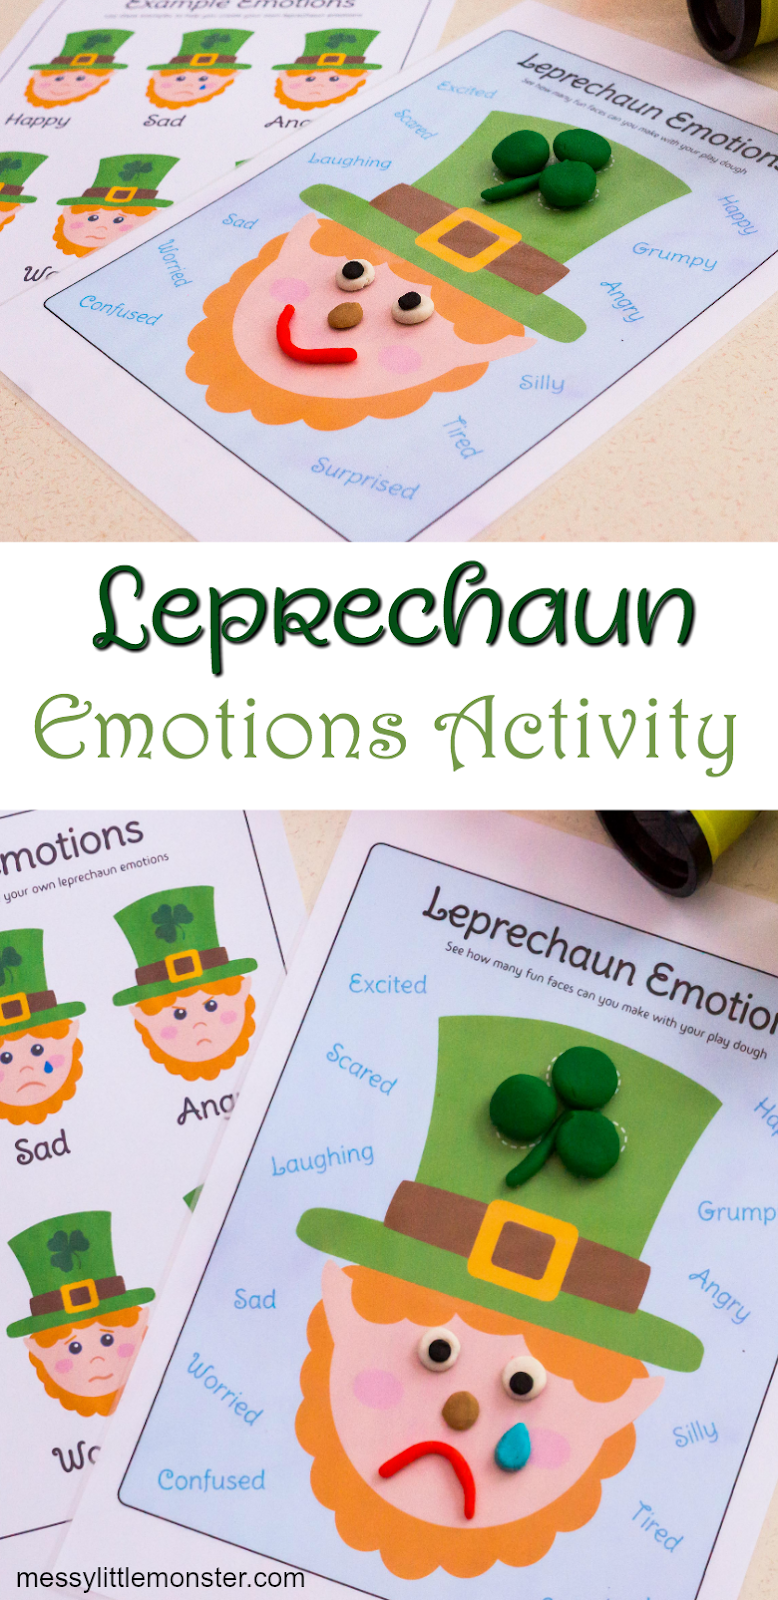 St Patricks Day playdough emotions activity pack. Including lerpechaun playdough mat.